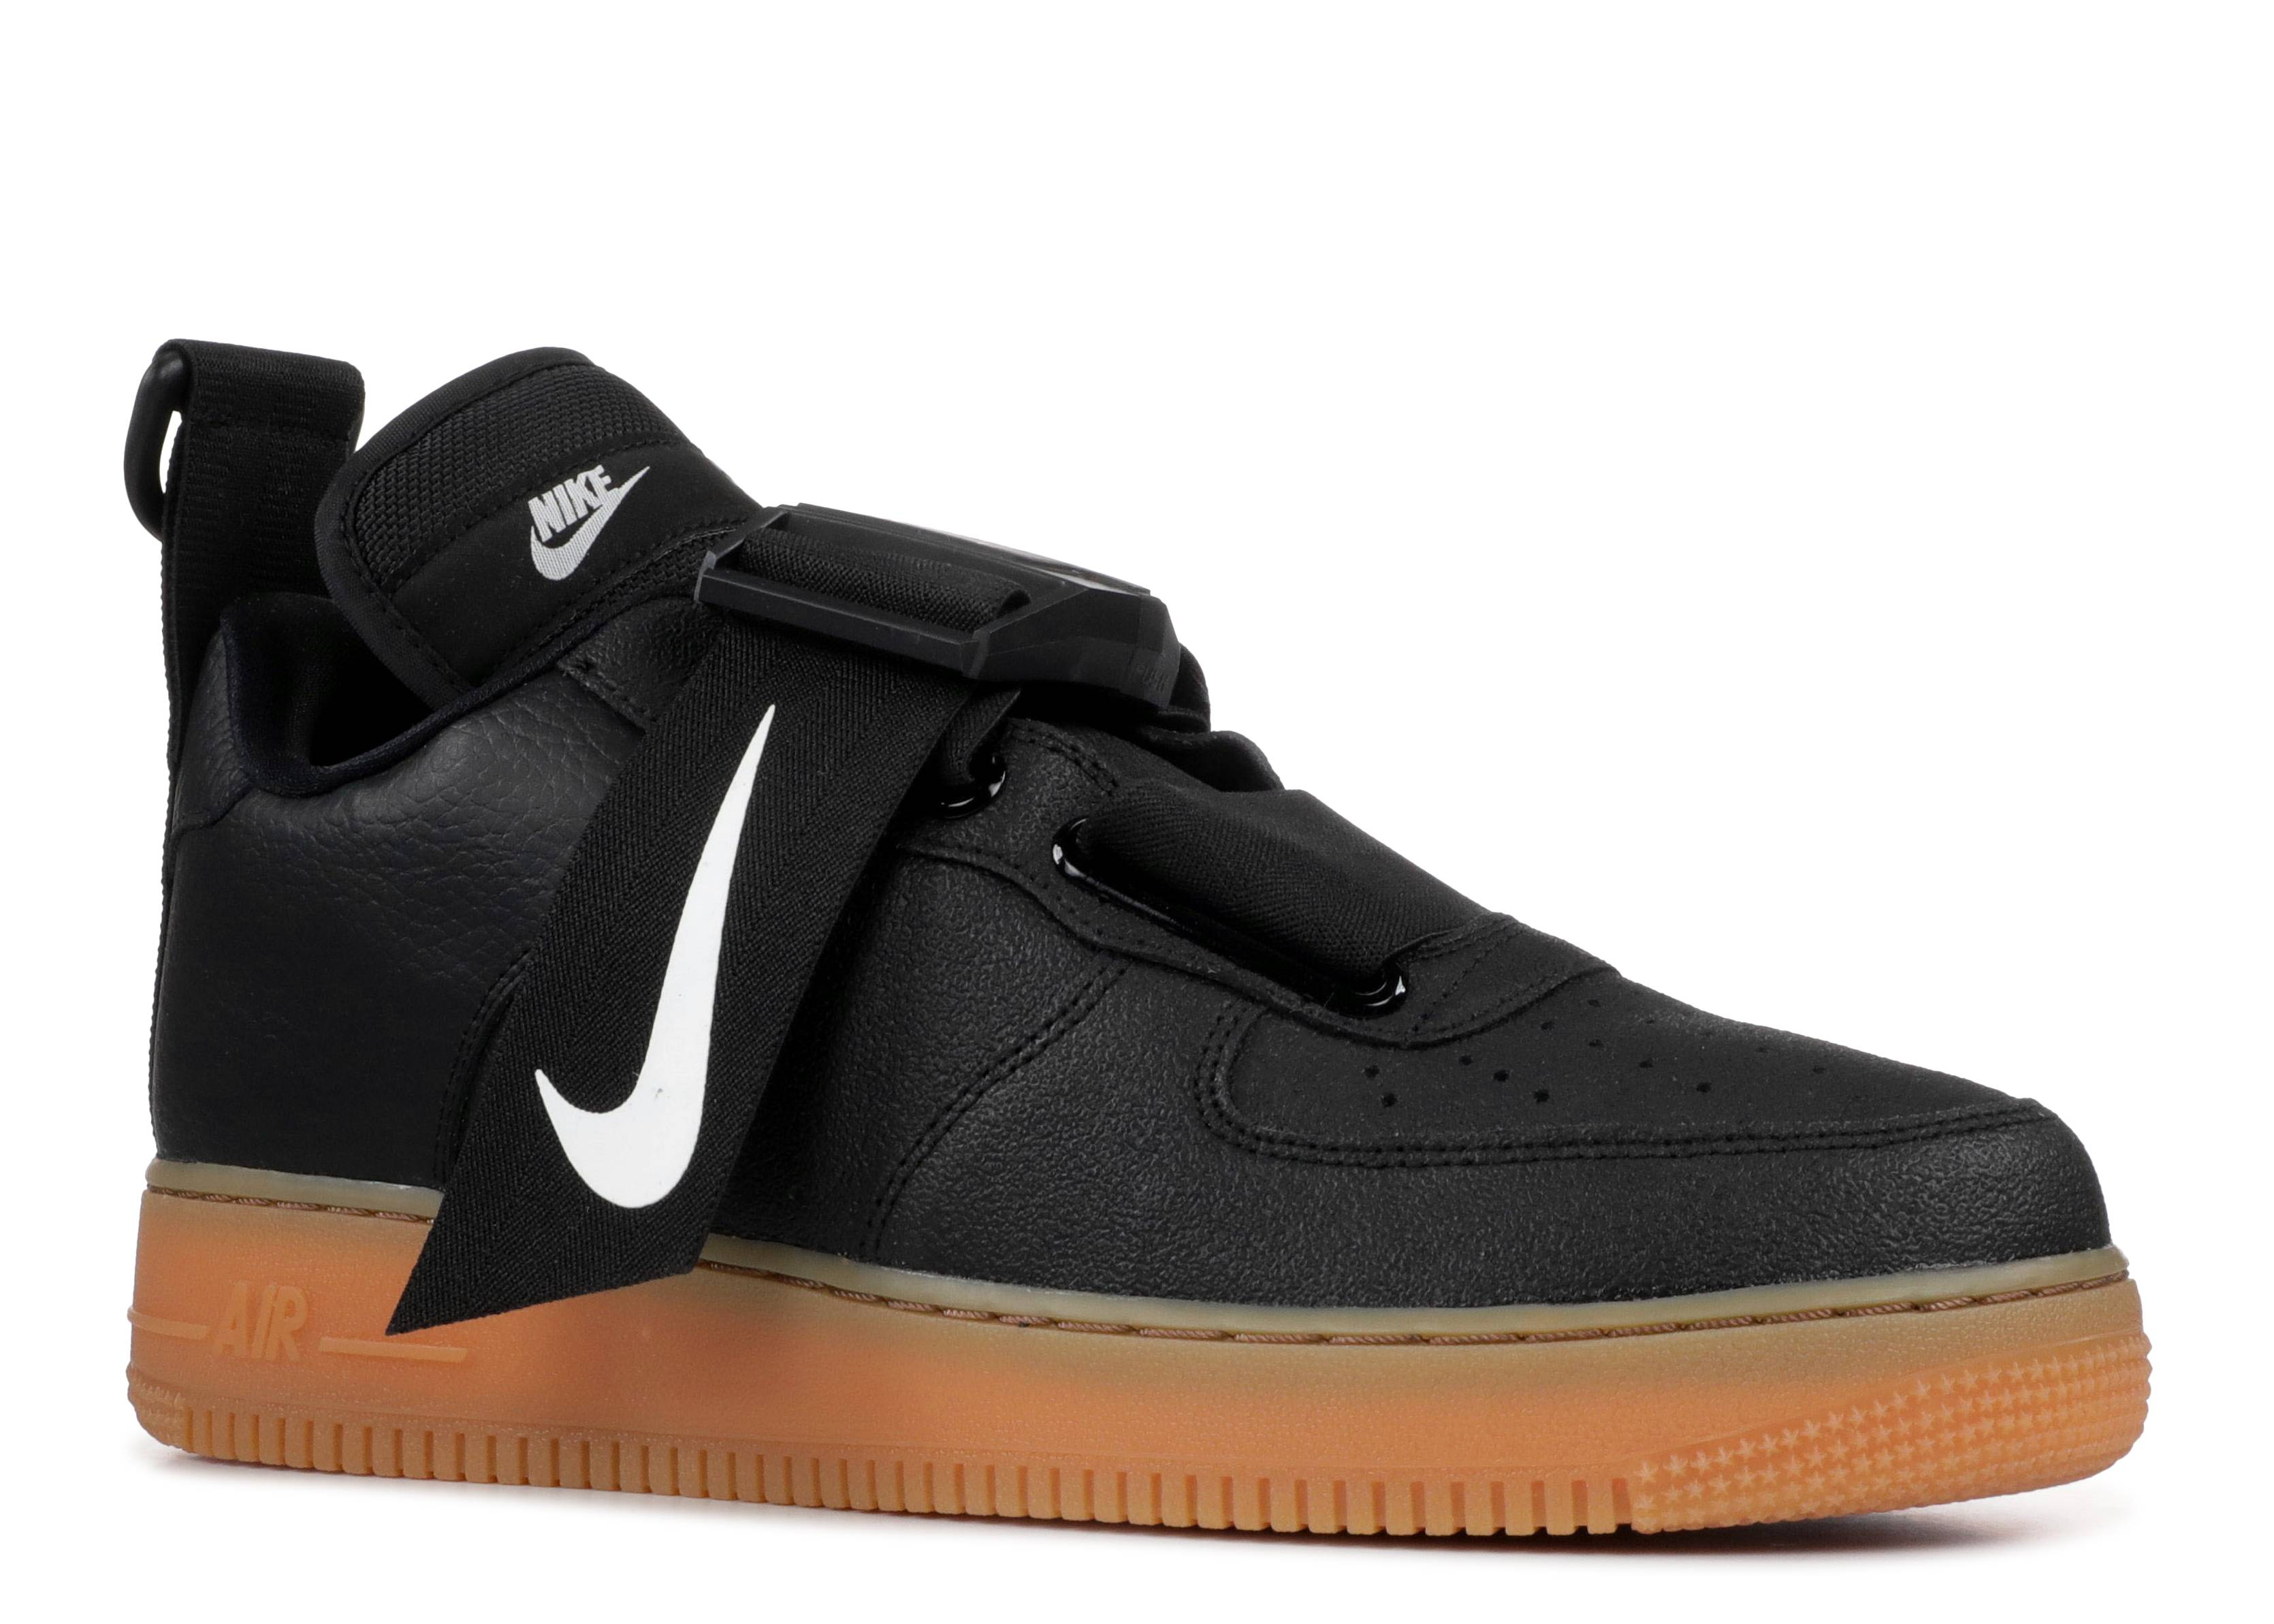 Nike Mens Air Force 1 Utility OBJ Low BlackWhiteGum Med Brown